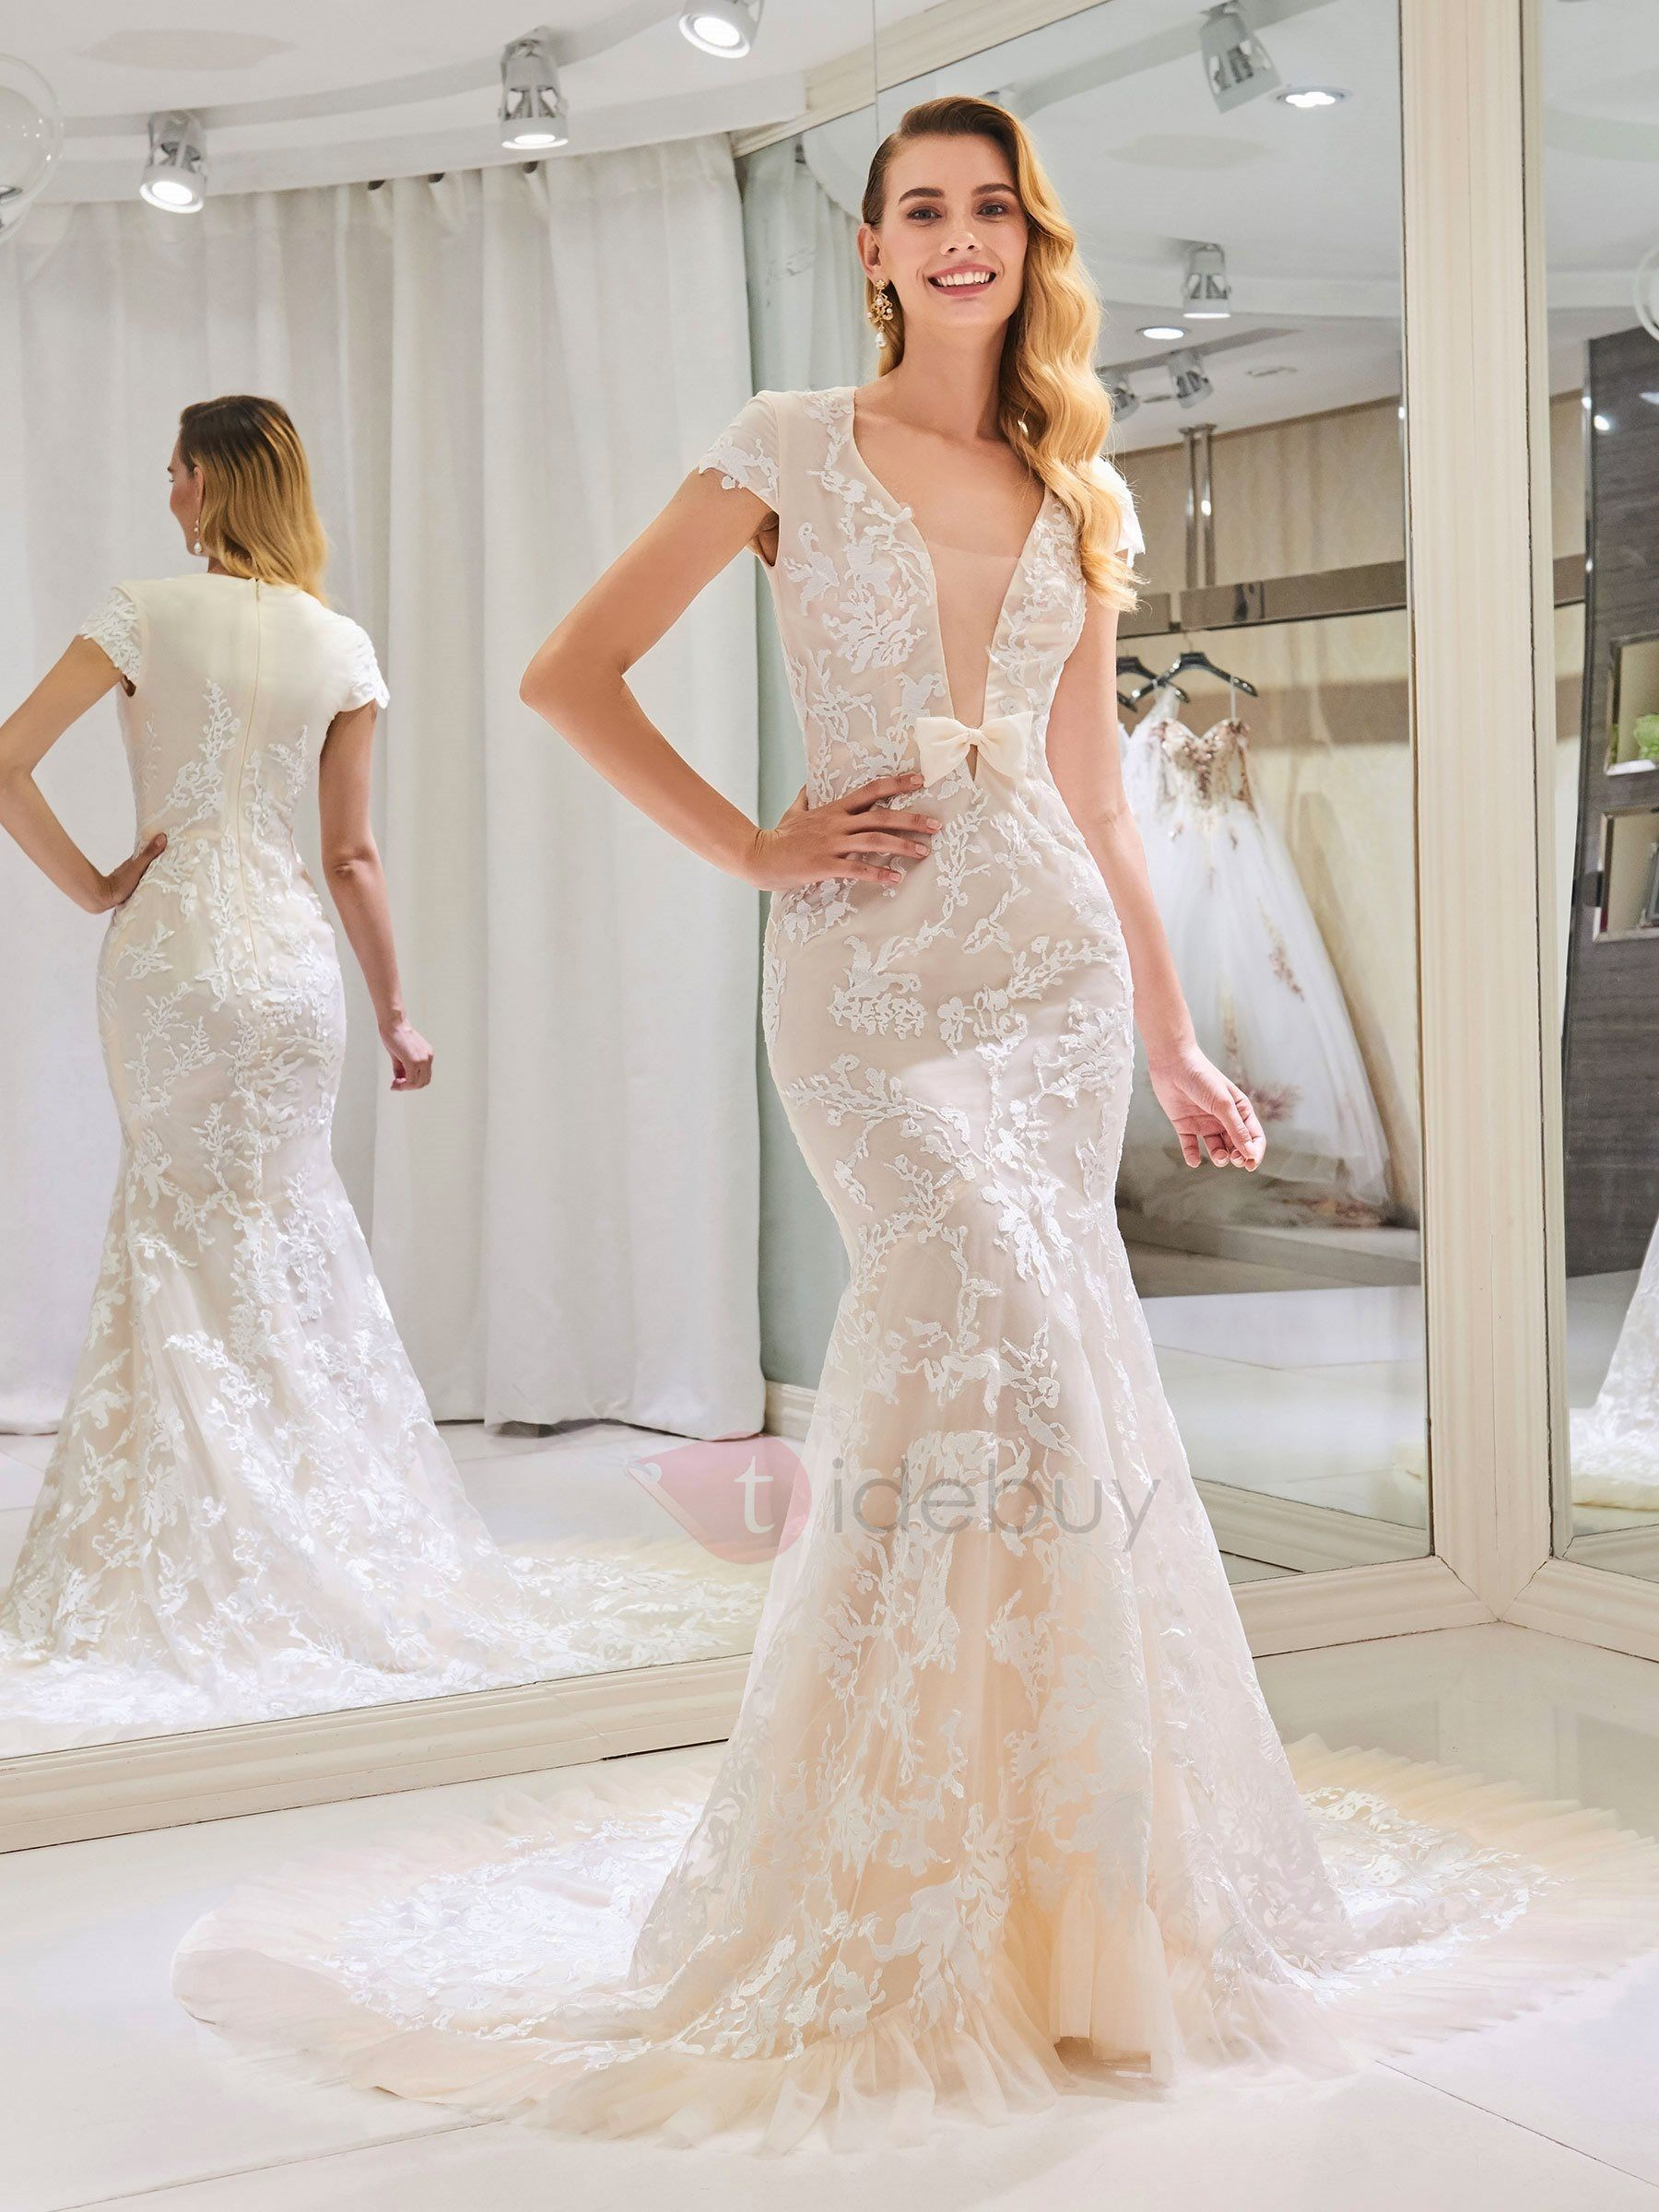 V Neck Cap Sleeve Appliques Lace Mermaid Wedding Dress Wedding Dress Cap Sleeves Wedding Cap Sleeves Outdoor Wedding Dress [ 2400 x 1800 Pixel ]